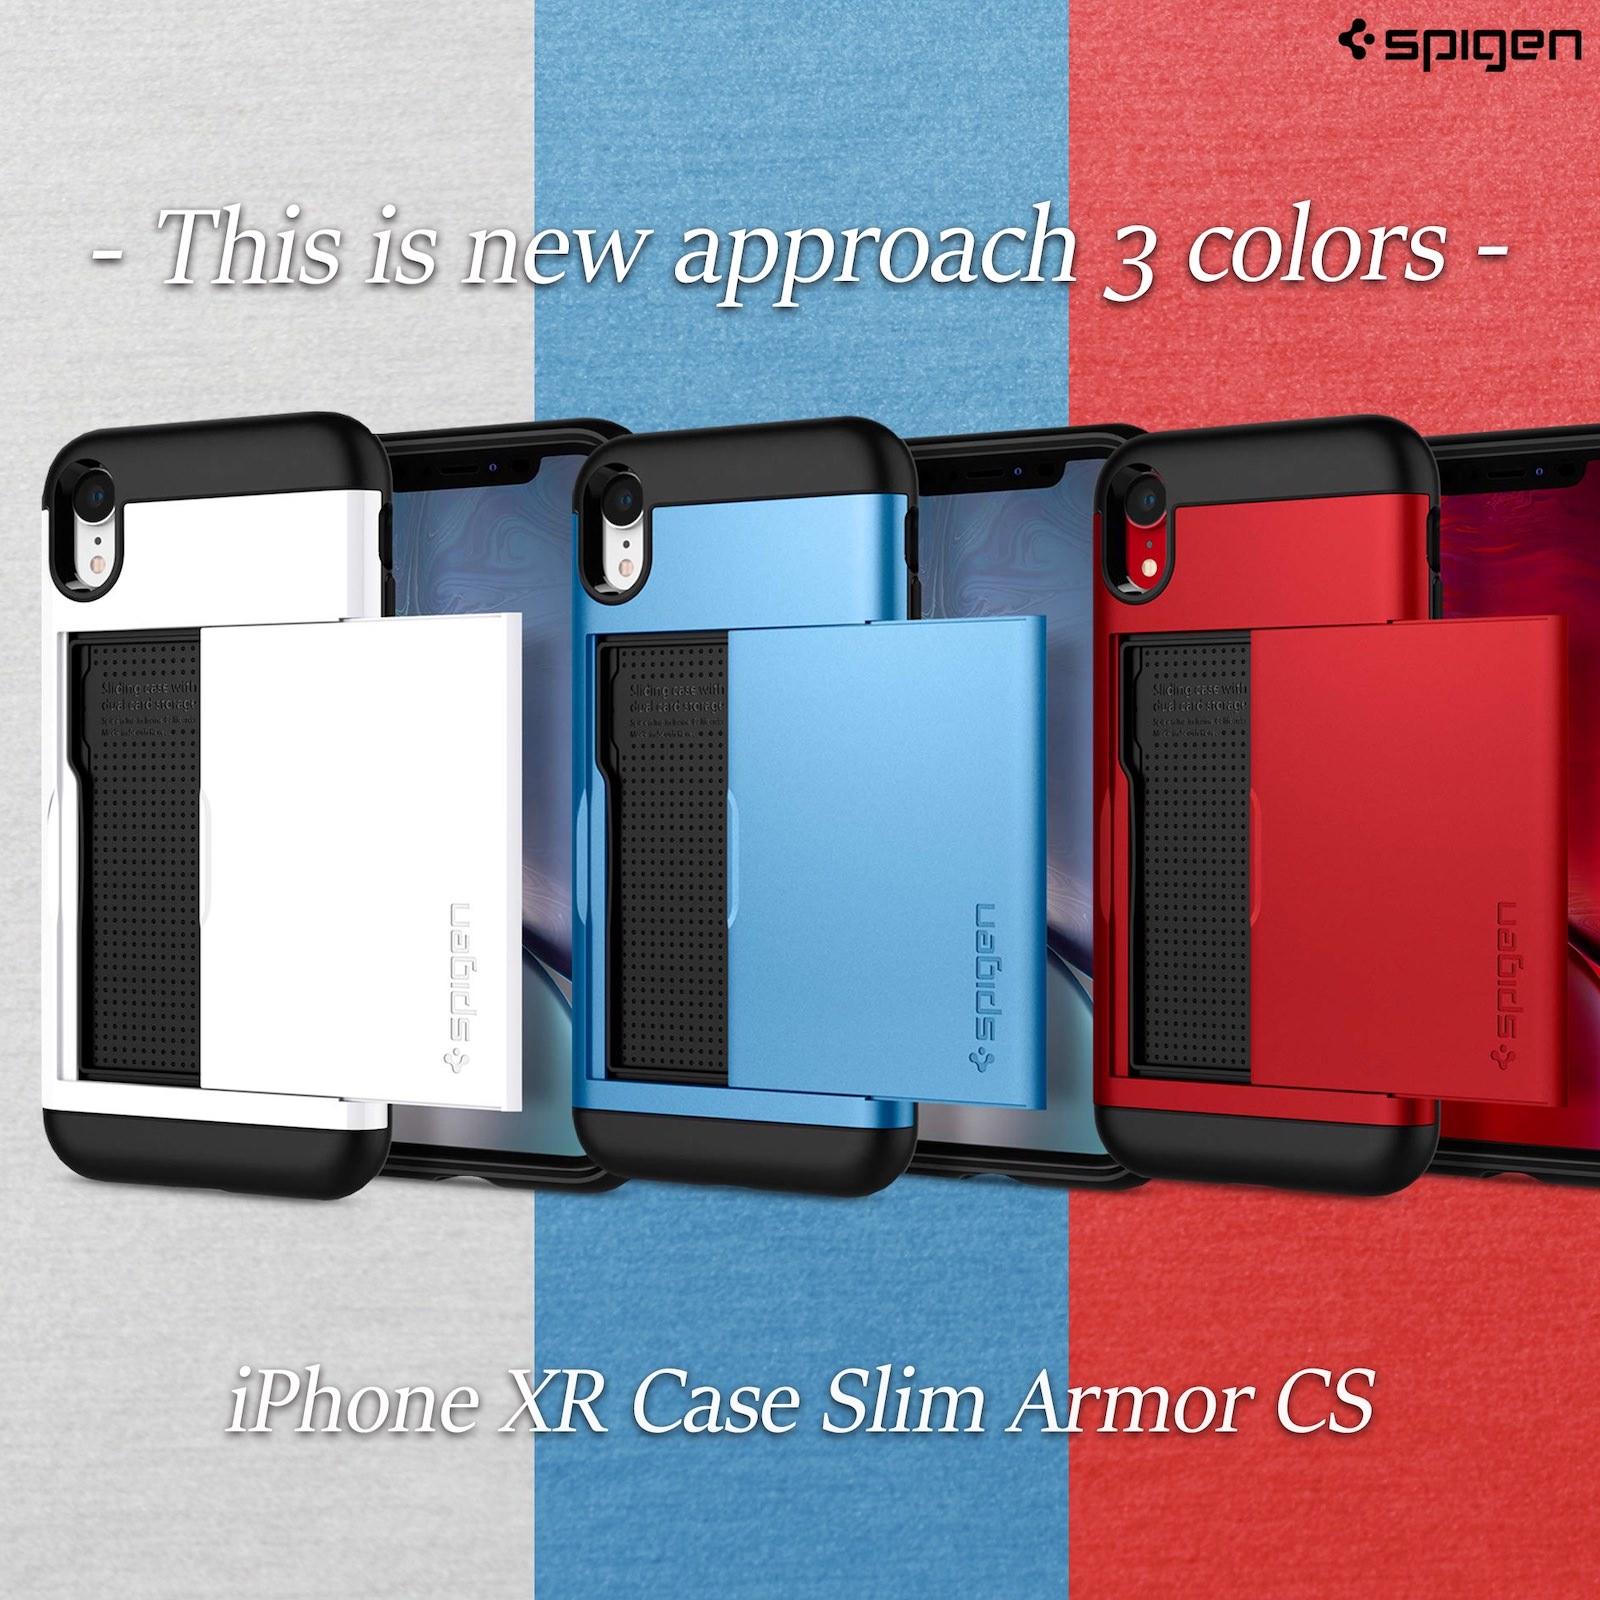 Slim armor cs 1